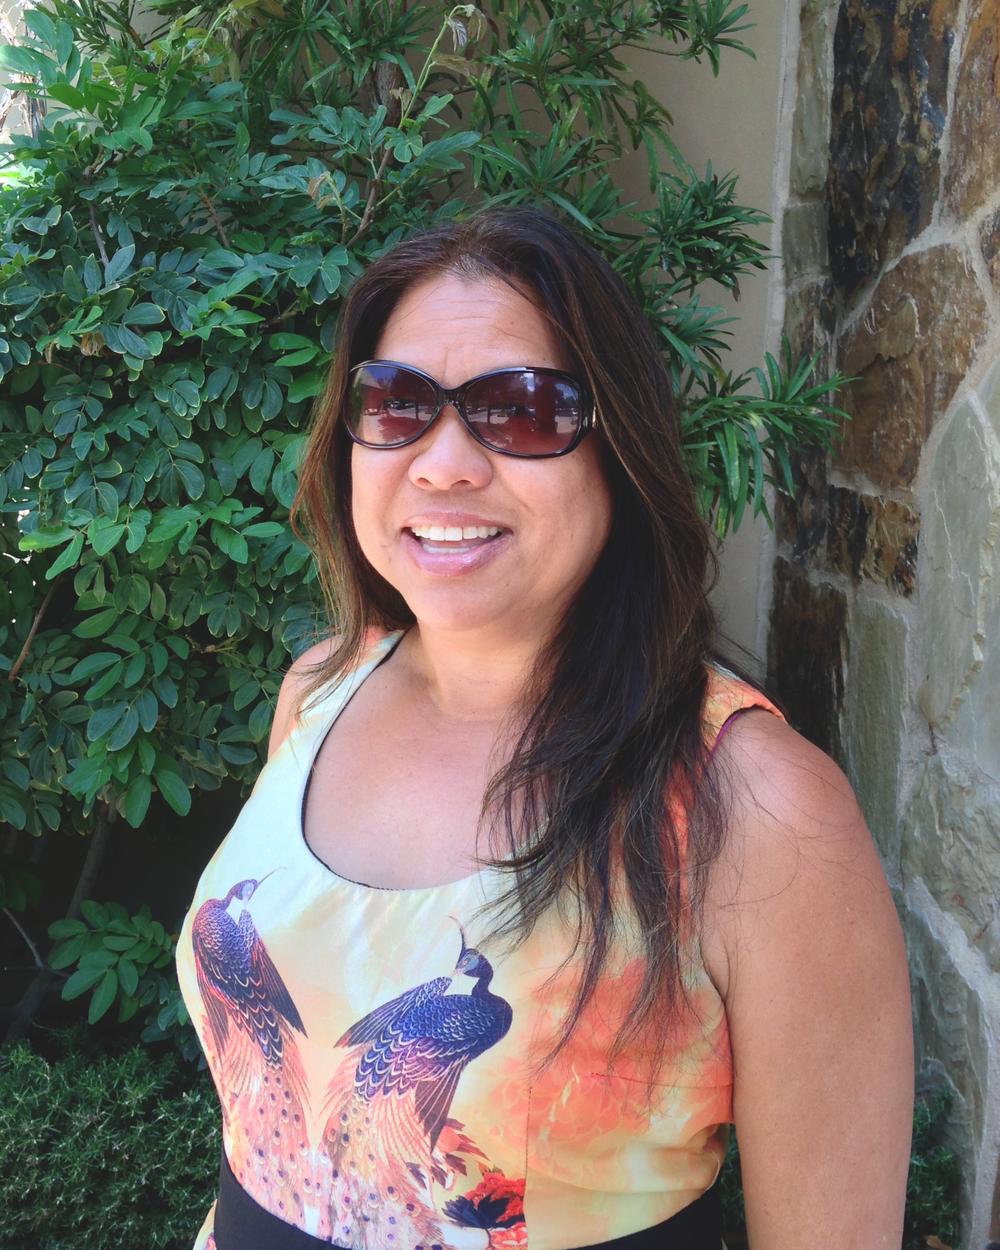 Sherylynne Carriveau    Recording Secretary   Sherylynne serves on staff at Long Beach Alliance Church and also facilitates the Women's Mentoring Program.